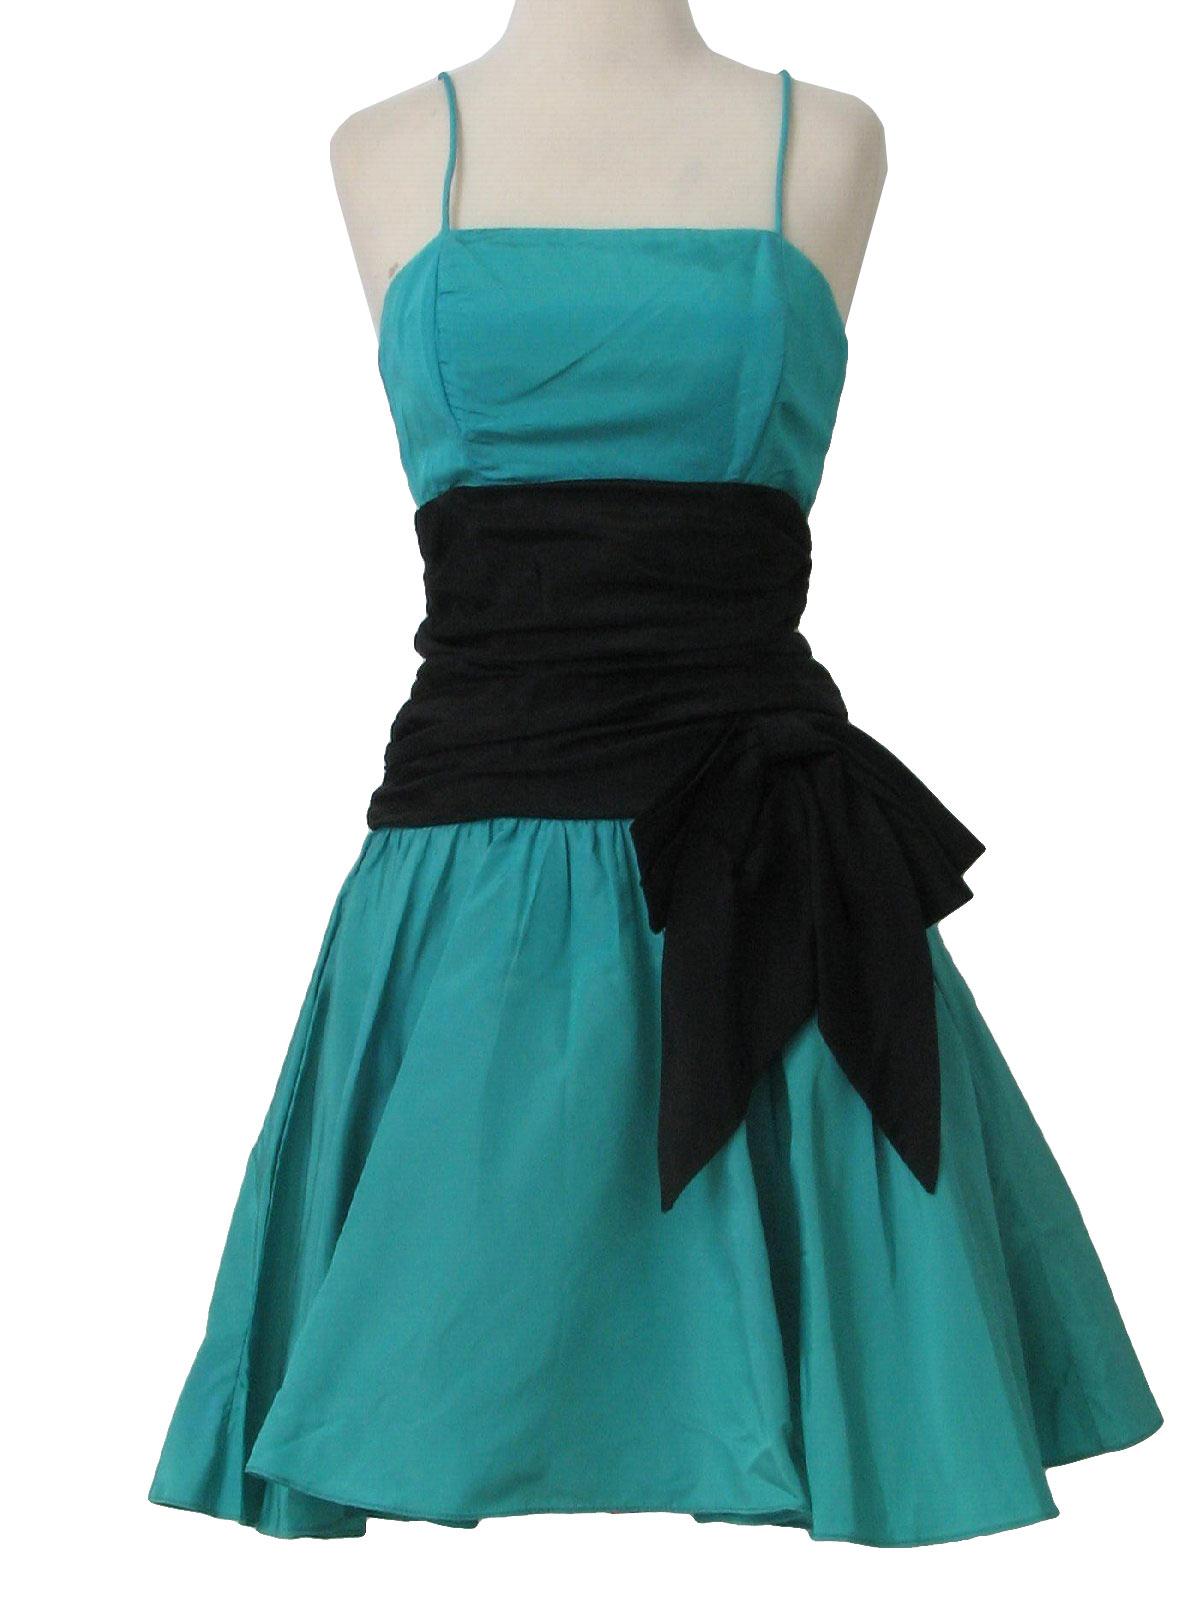 Retro 1980s Cocktail Dress: 80s -Union Label- Womens seam ...